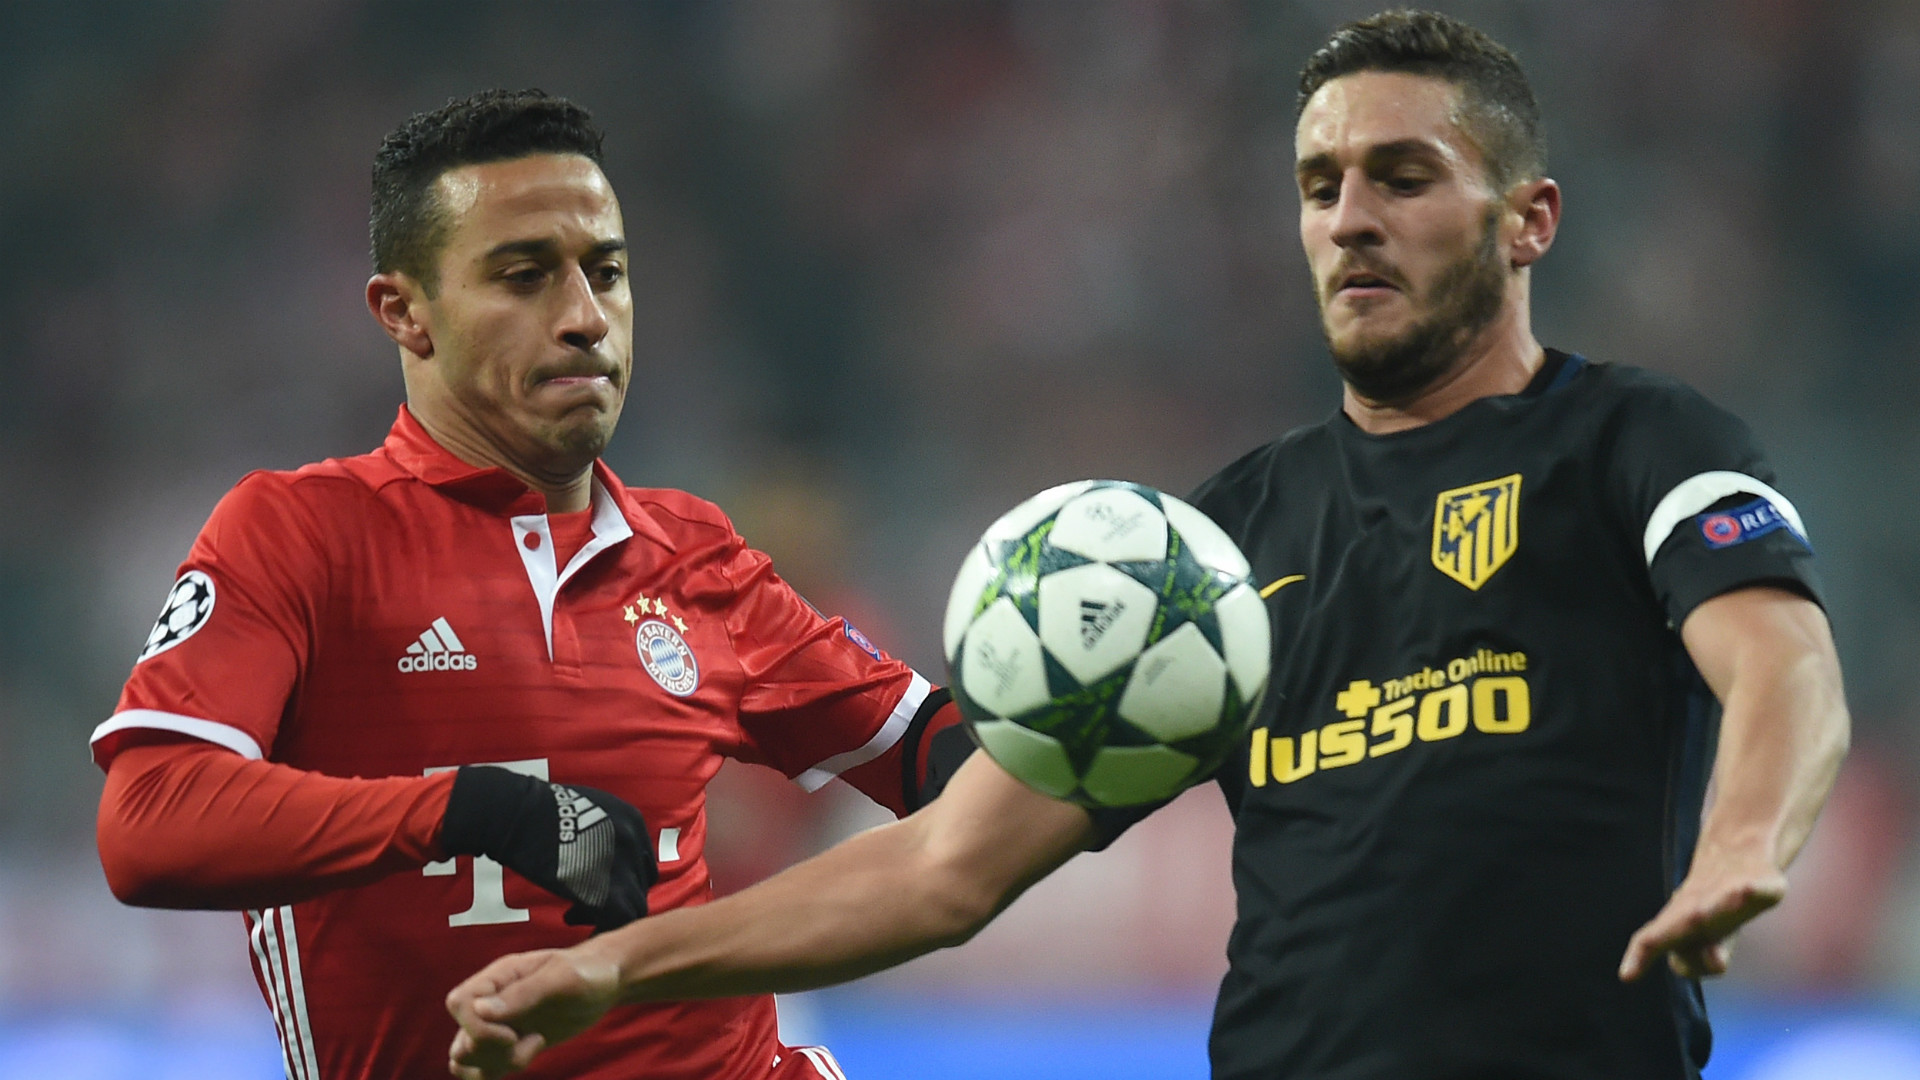 THIAGO BAYERN MUNCHEN KOKE ATLETICO MADRID UEFA CHAMPIONS LEAGUE 06122016